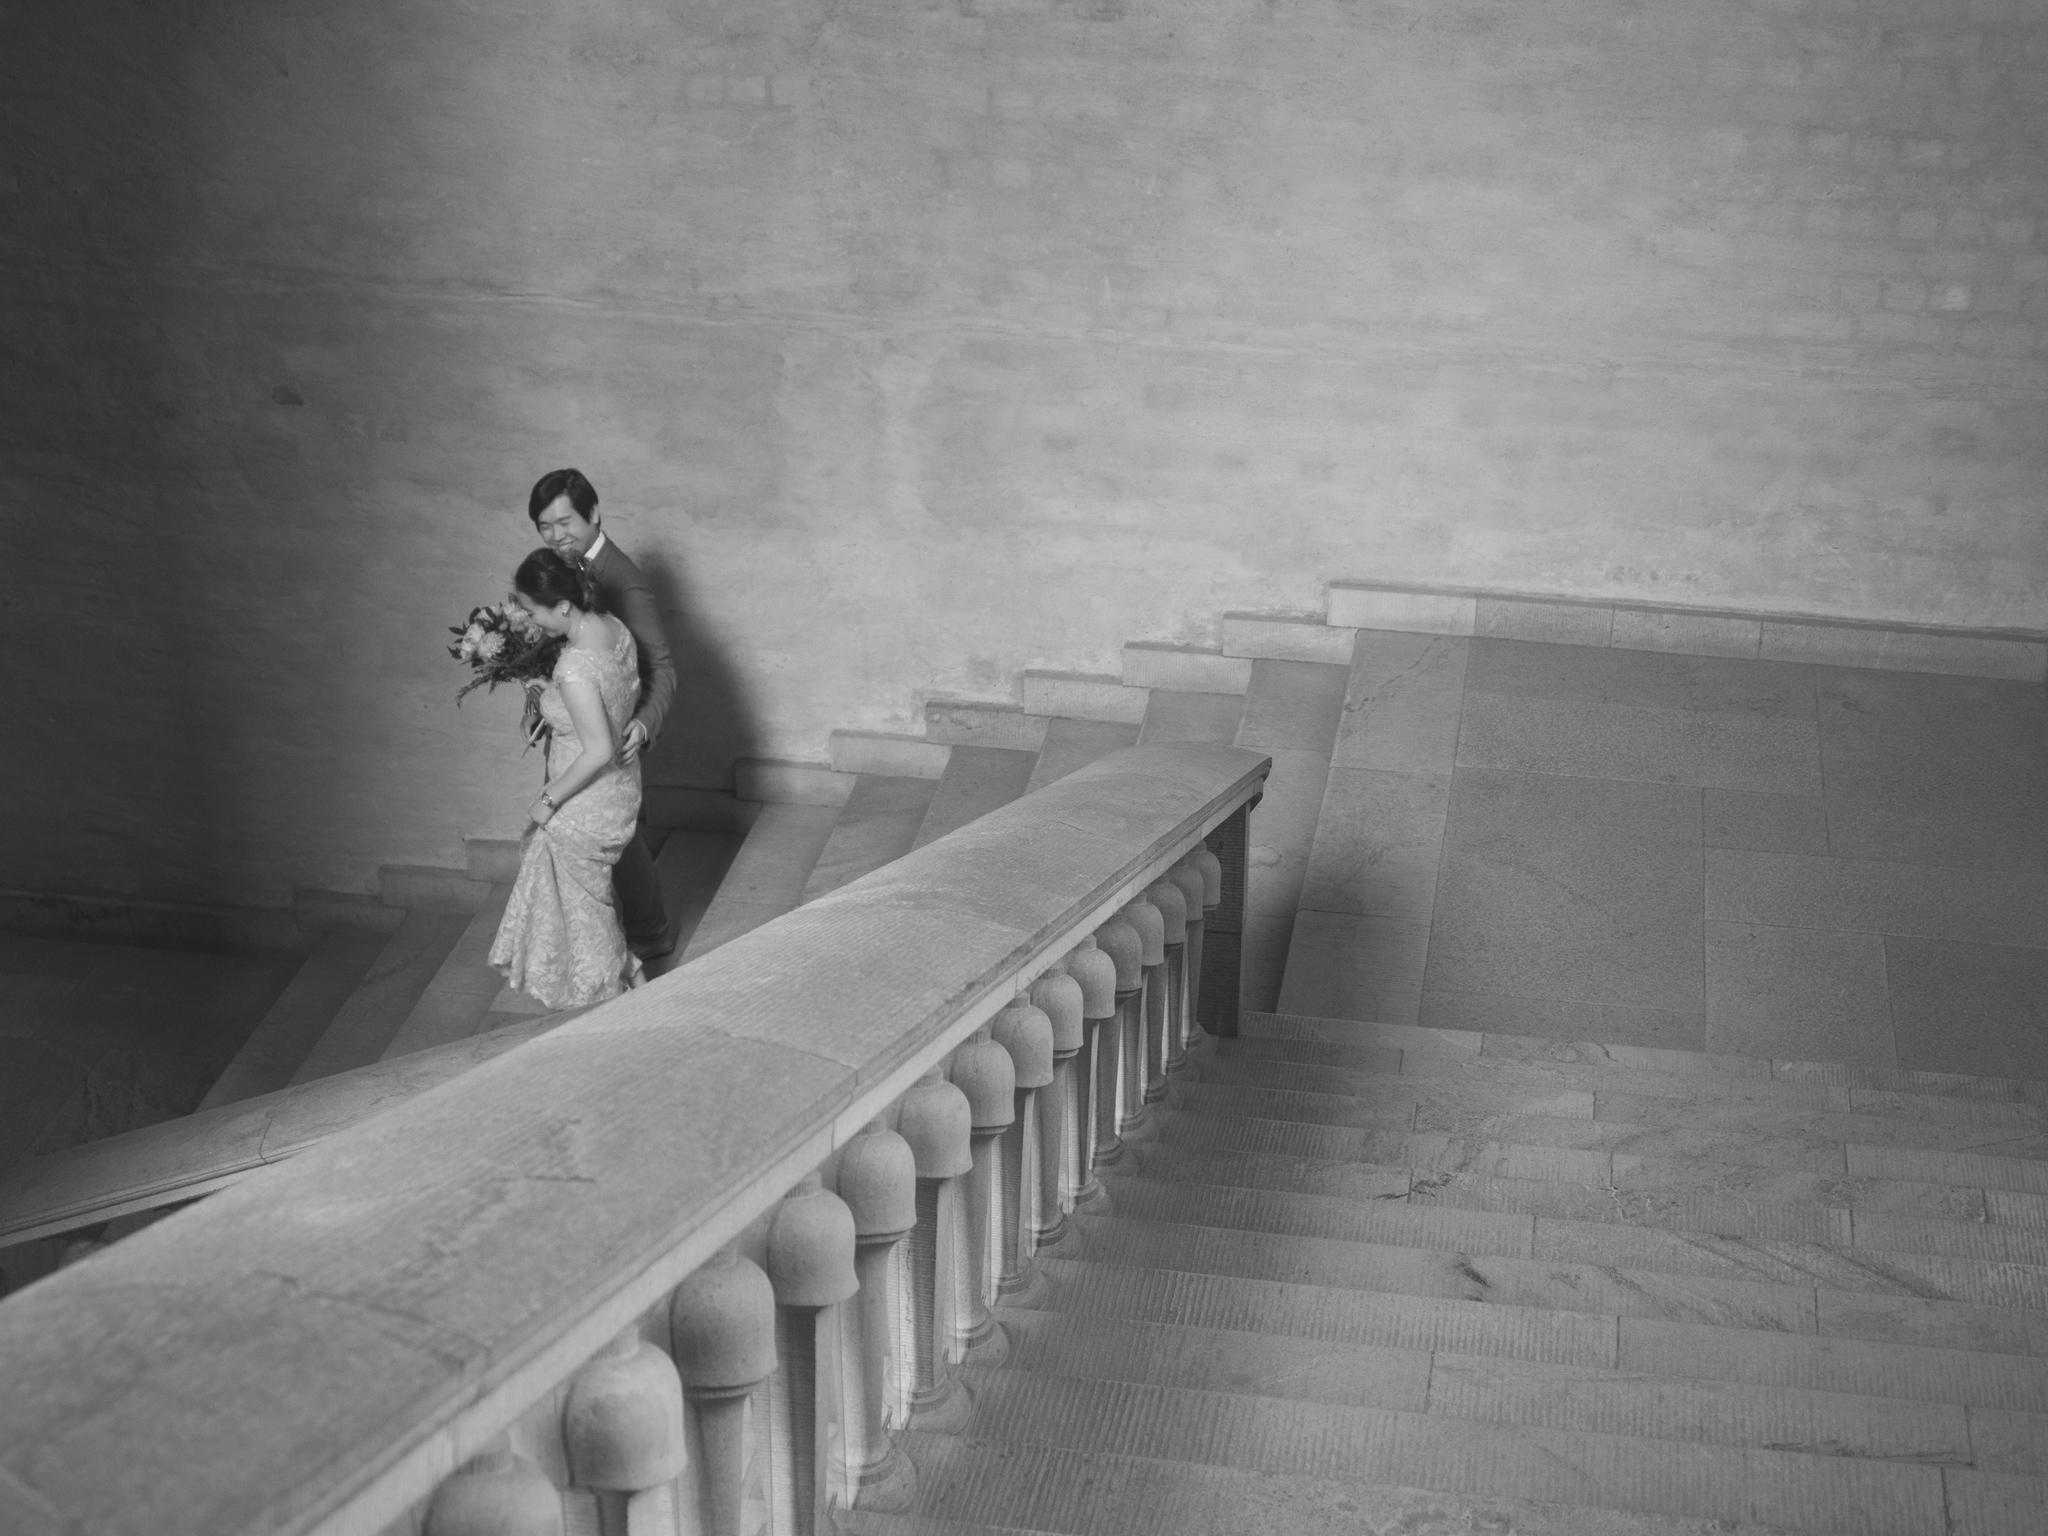 brollopsfotografering i stockholms stadshus